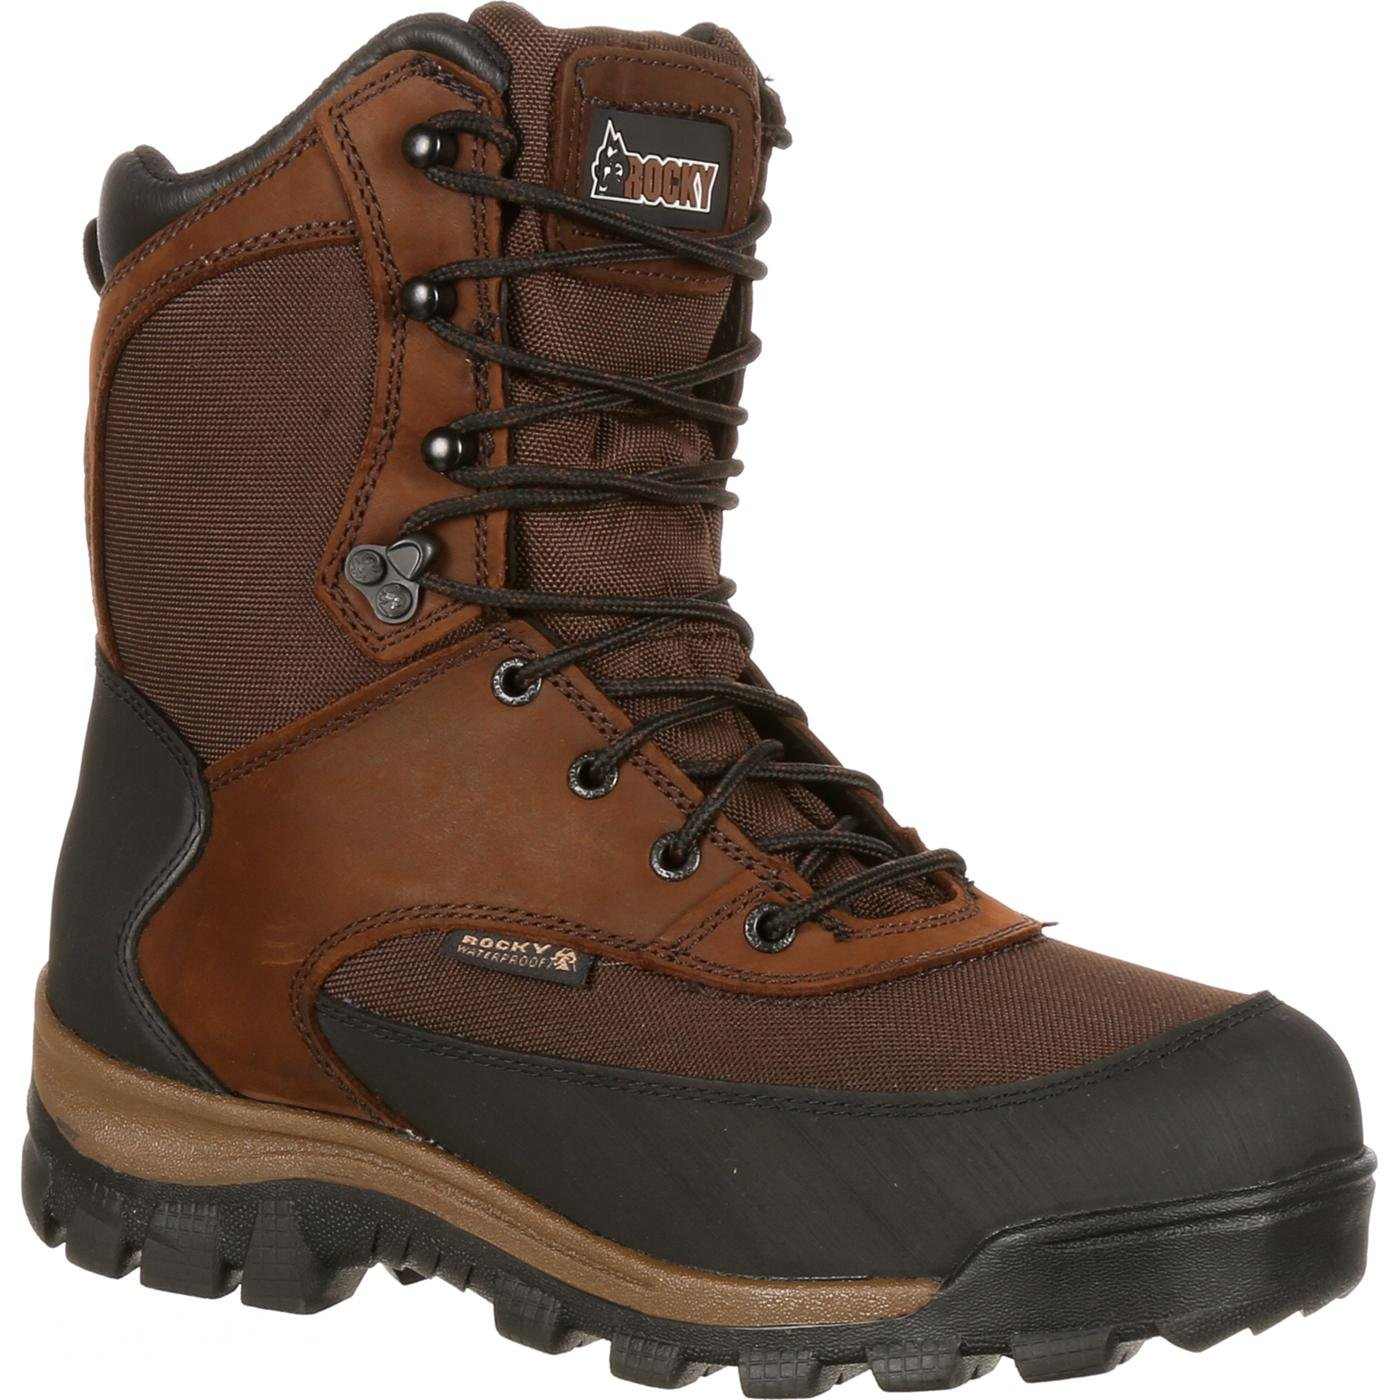 ROCKY Men's FQ0004753 Mid Calf Boot, Dark Brown, 13 M US by ROCKY